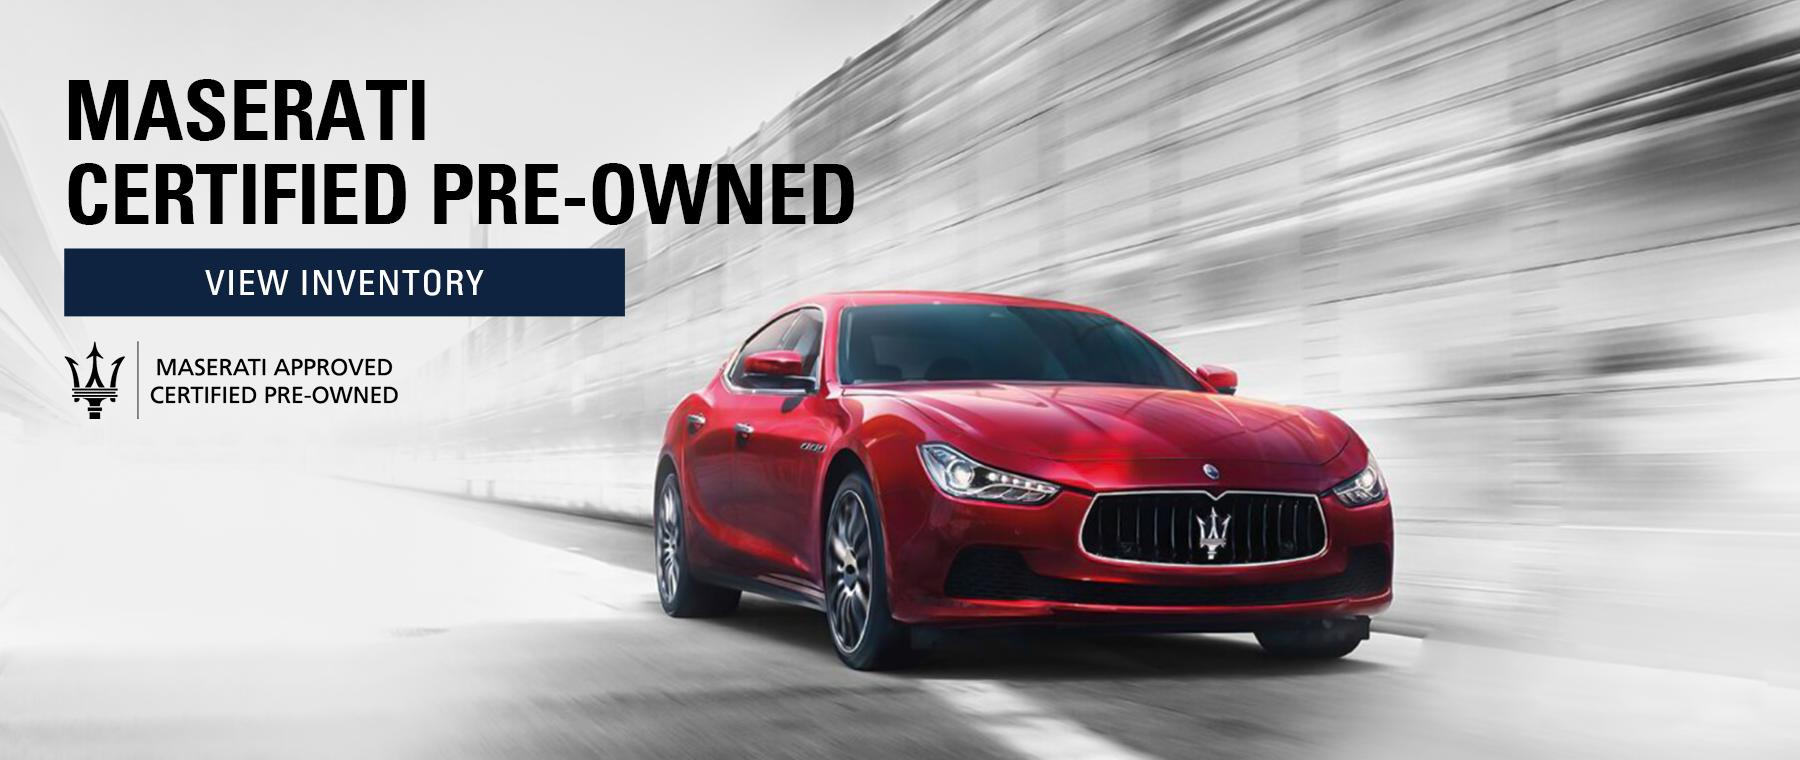 Maserati of Fort Laudedale | Used Maserati